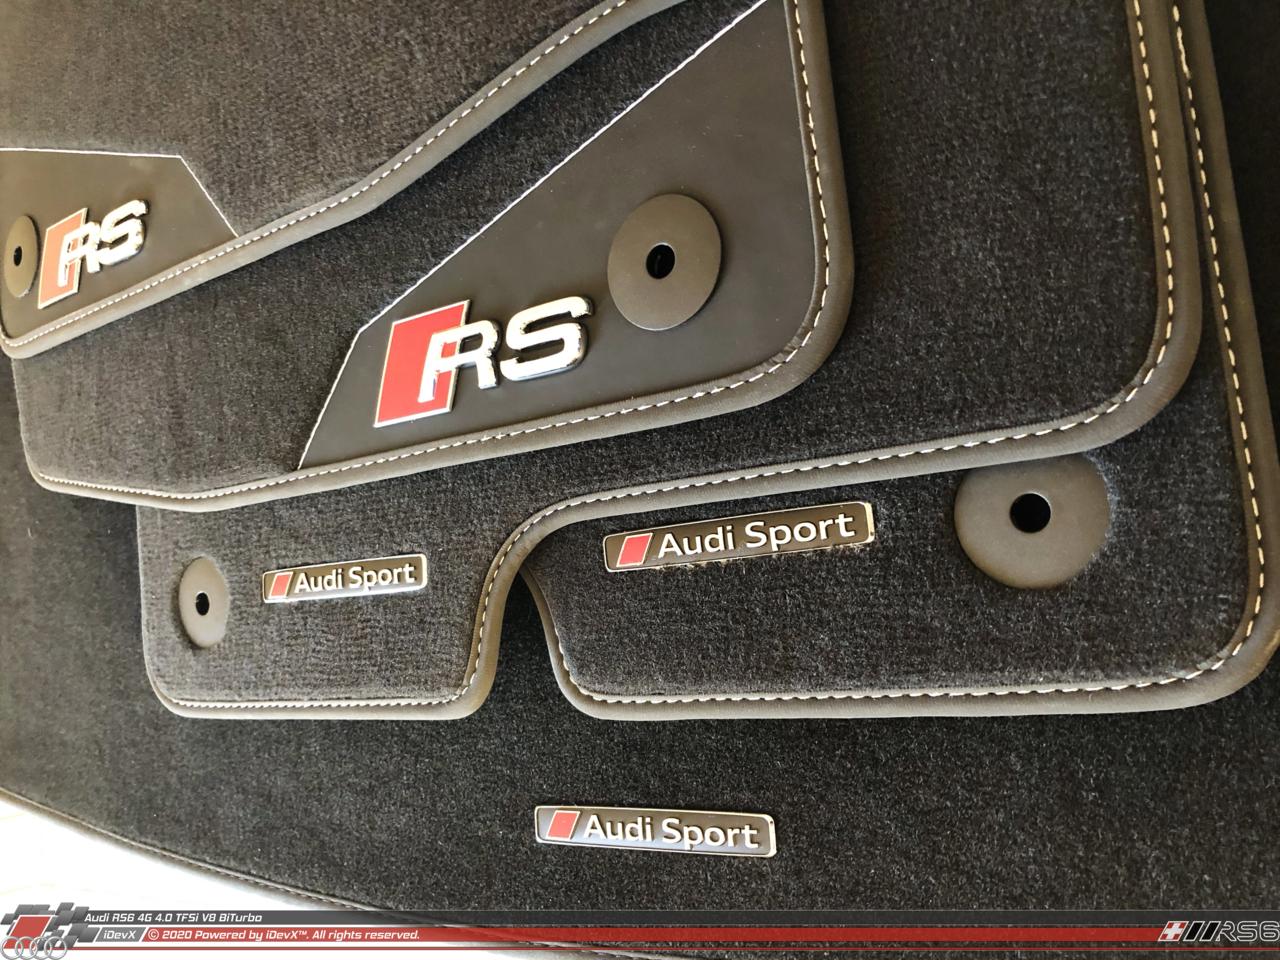 15_08.2019_Audi-RS6_iDevX_020.png